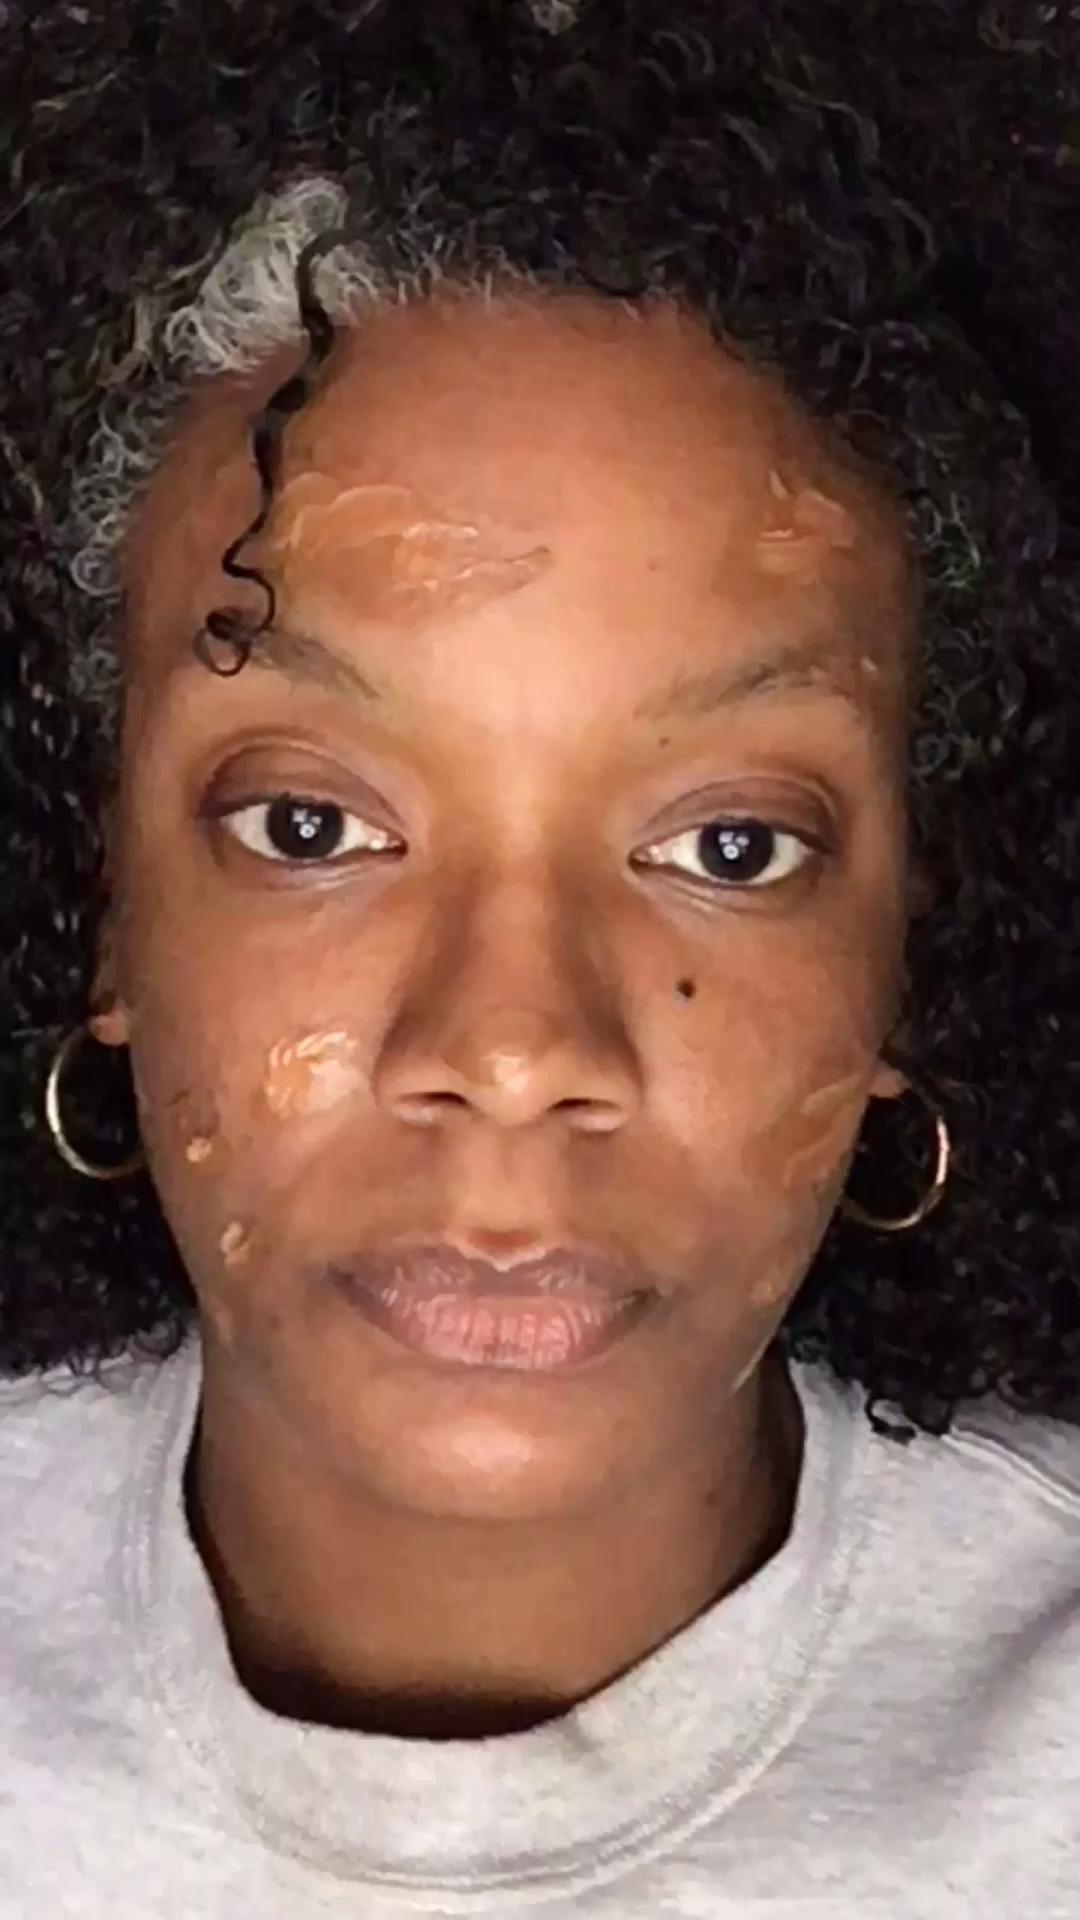 Everyday Makeup w/o Foundation everydaymakeup Dark skin